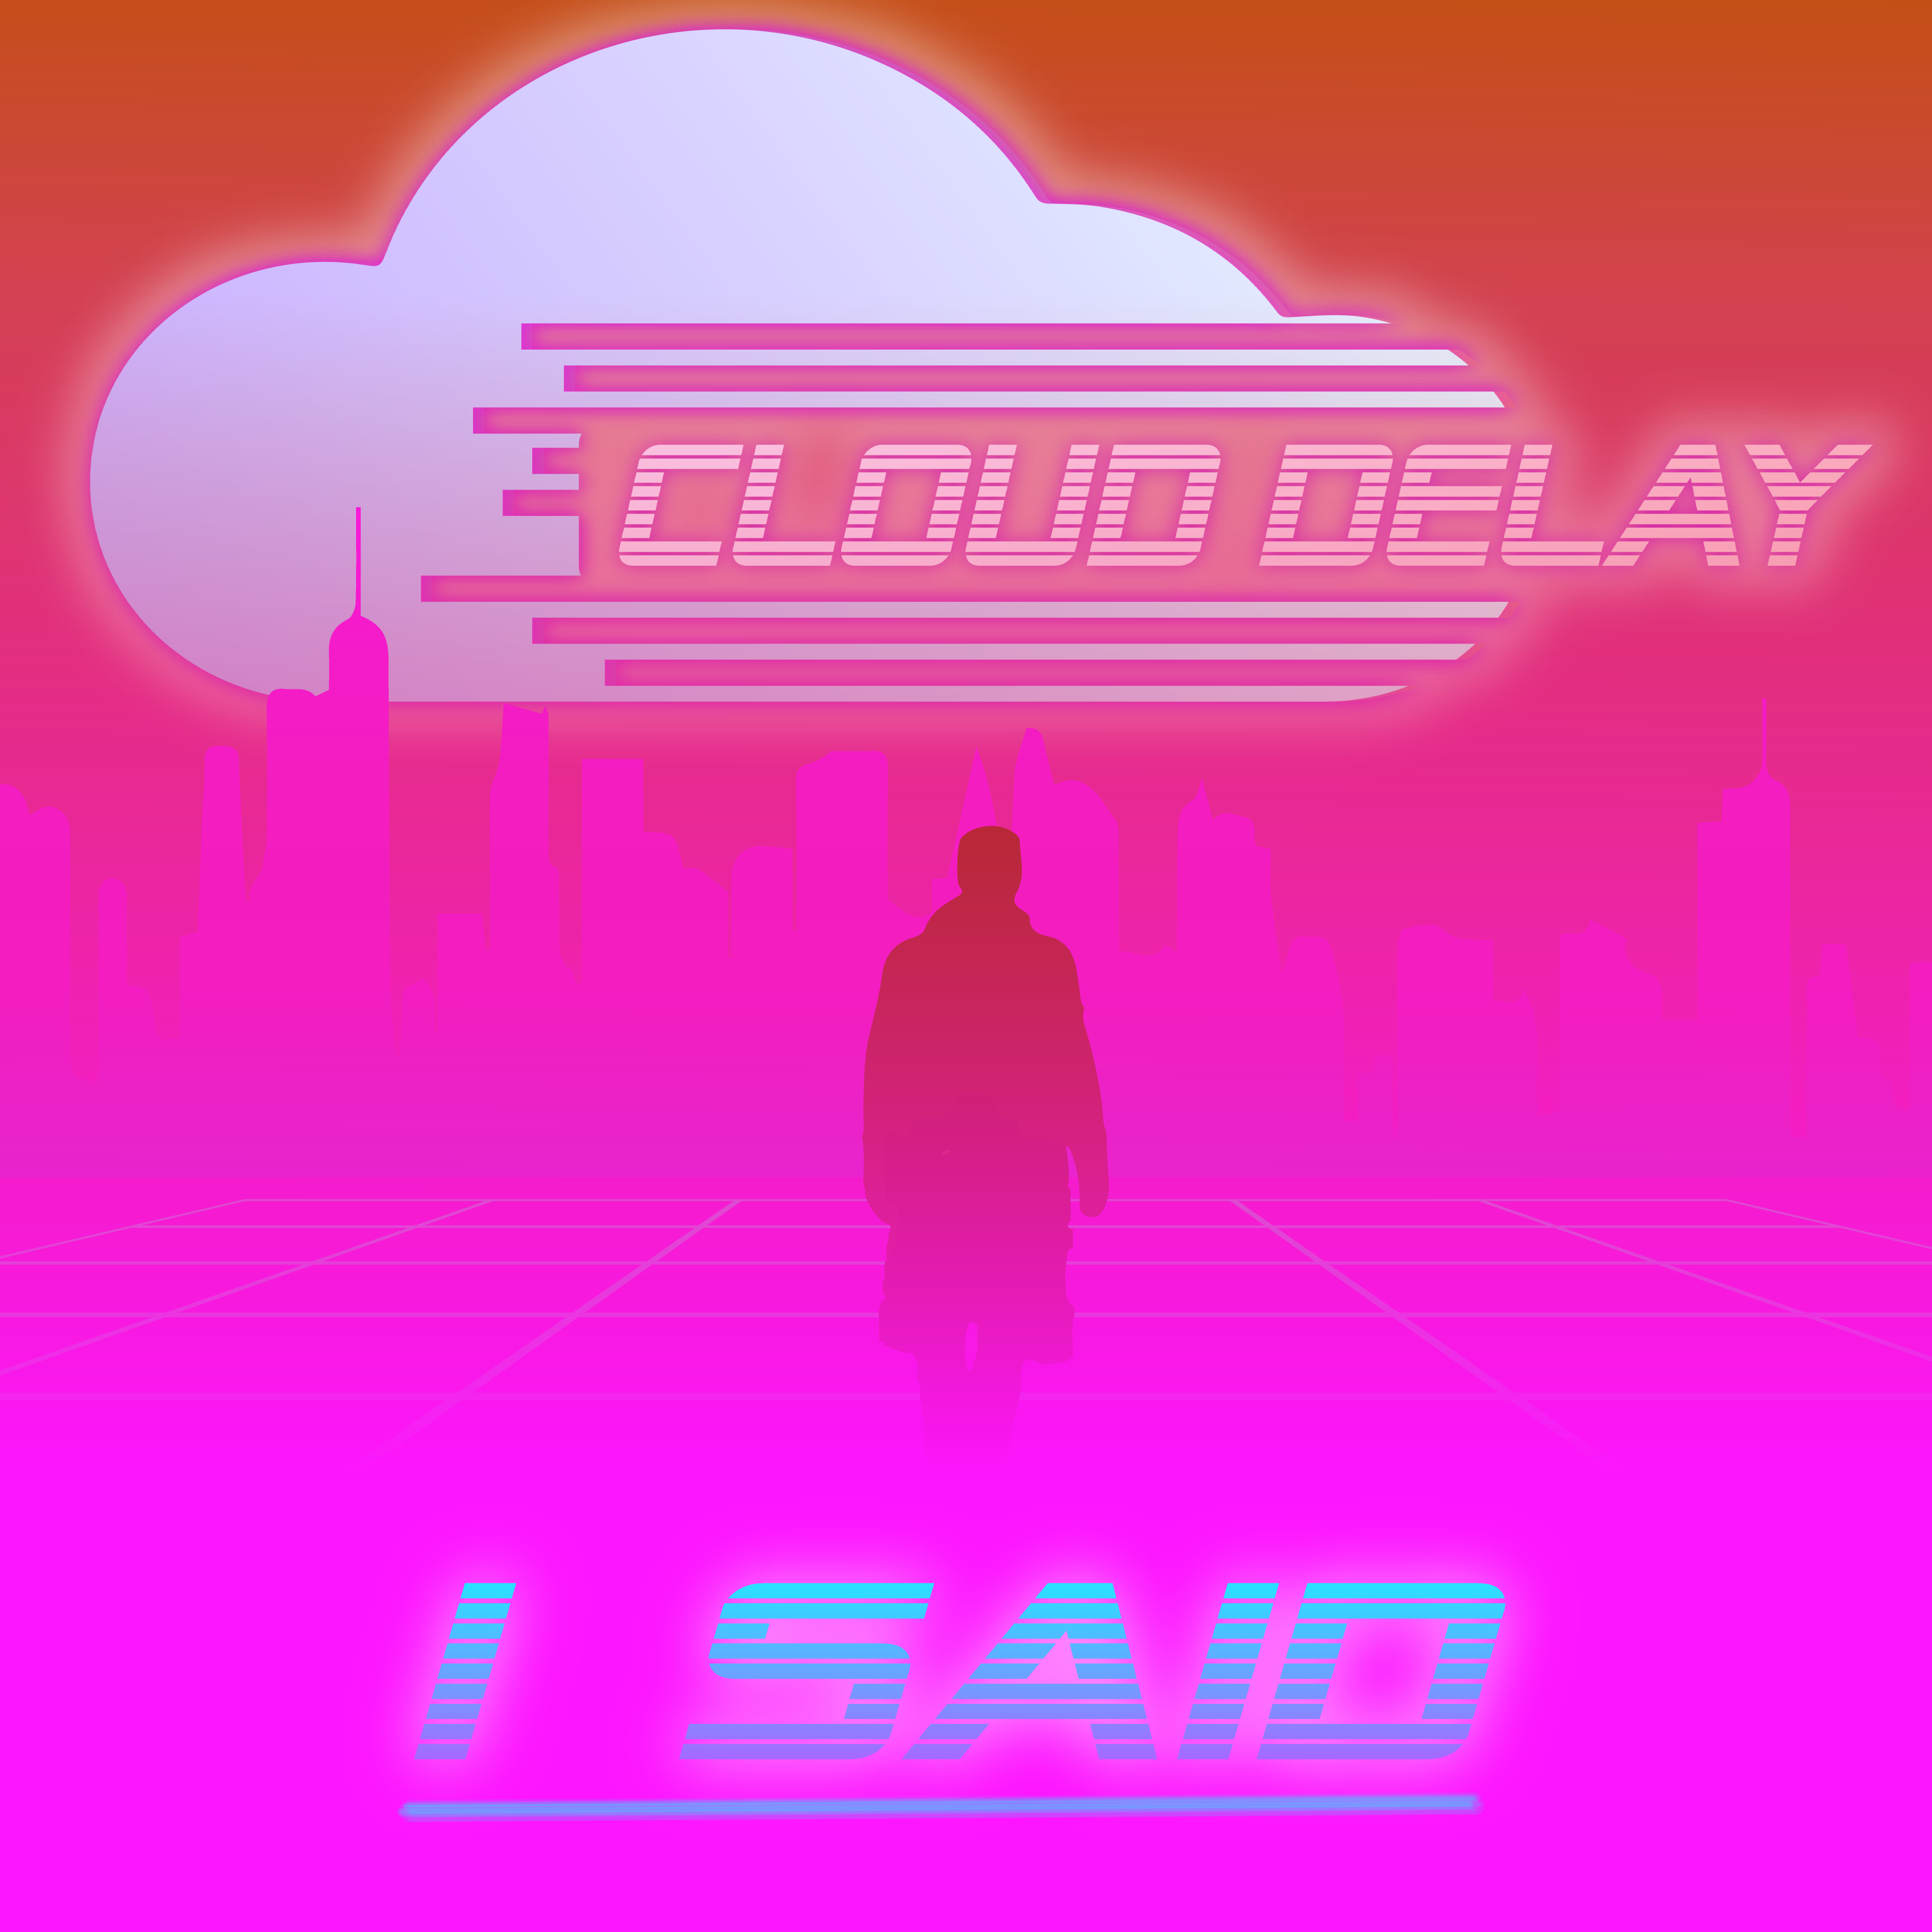 Логотип музыкального проекта и обложка сингла фото f_5165b674a6a9c7cb.png